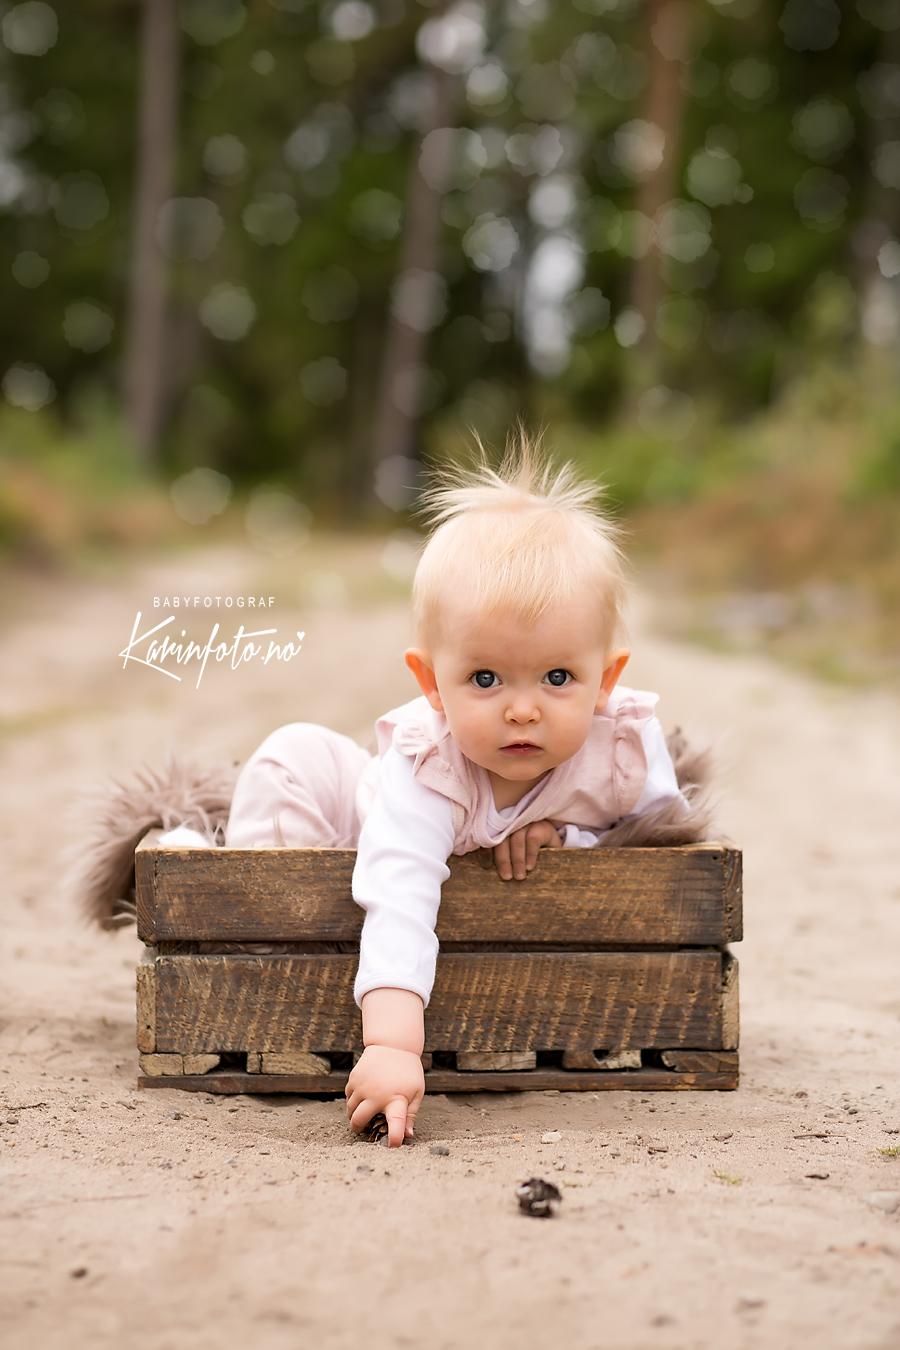 karinfoto_babyfotograf_utefotografering_babyfoto_fotograf_karinpedersen_ettarsfotografering_